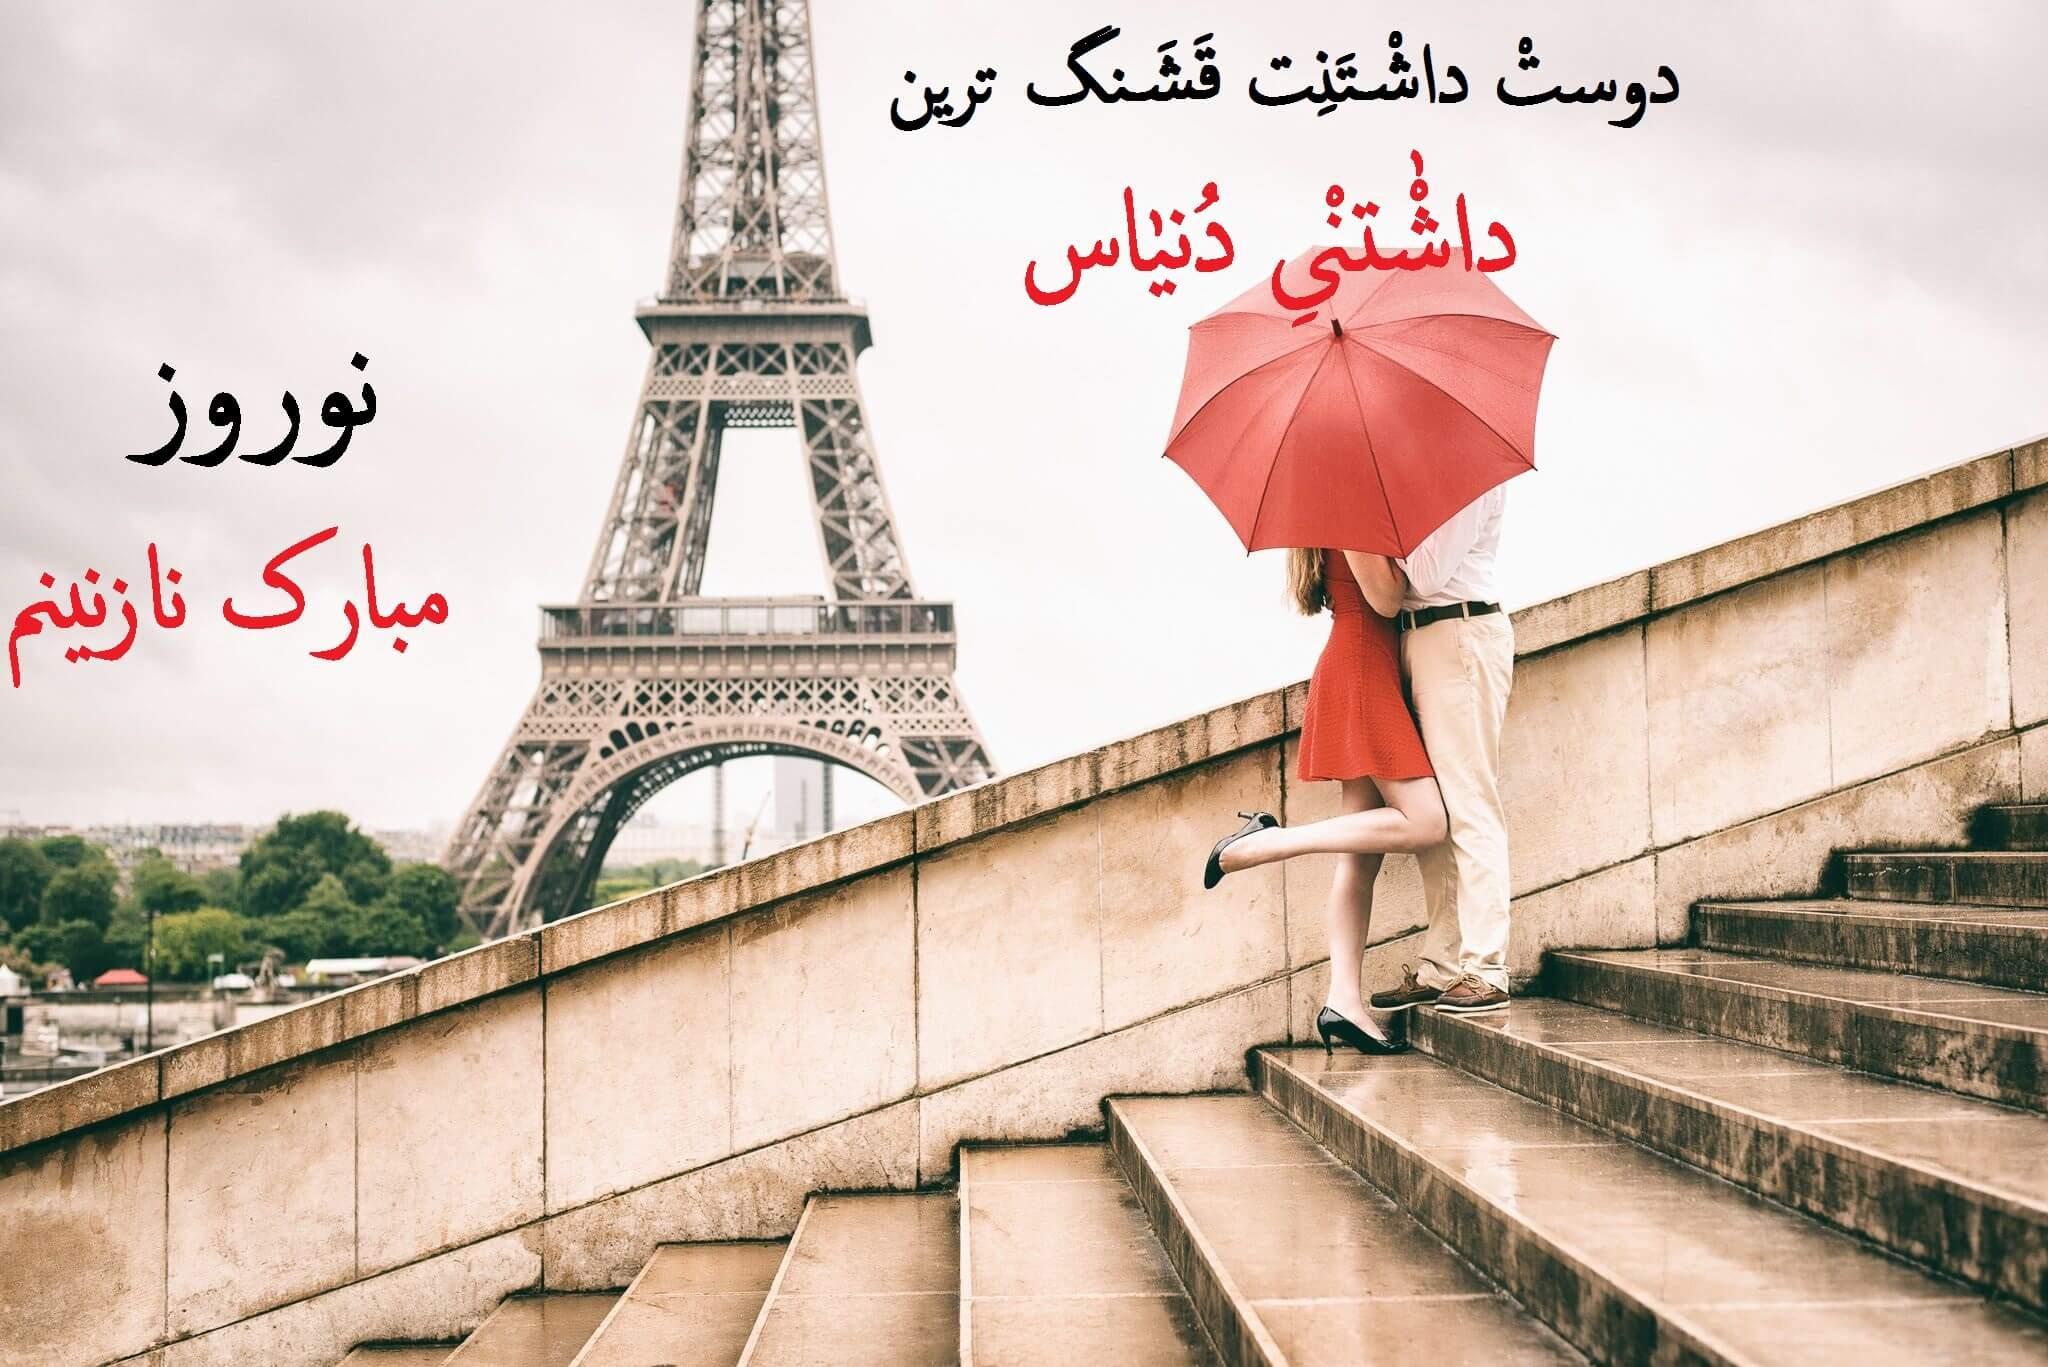 عکس نوشته تبریک عید نوروز زیبا به عشقم